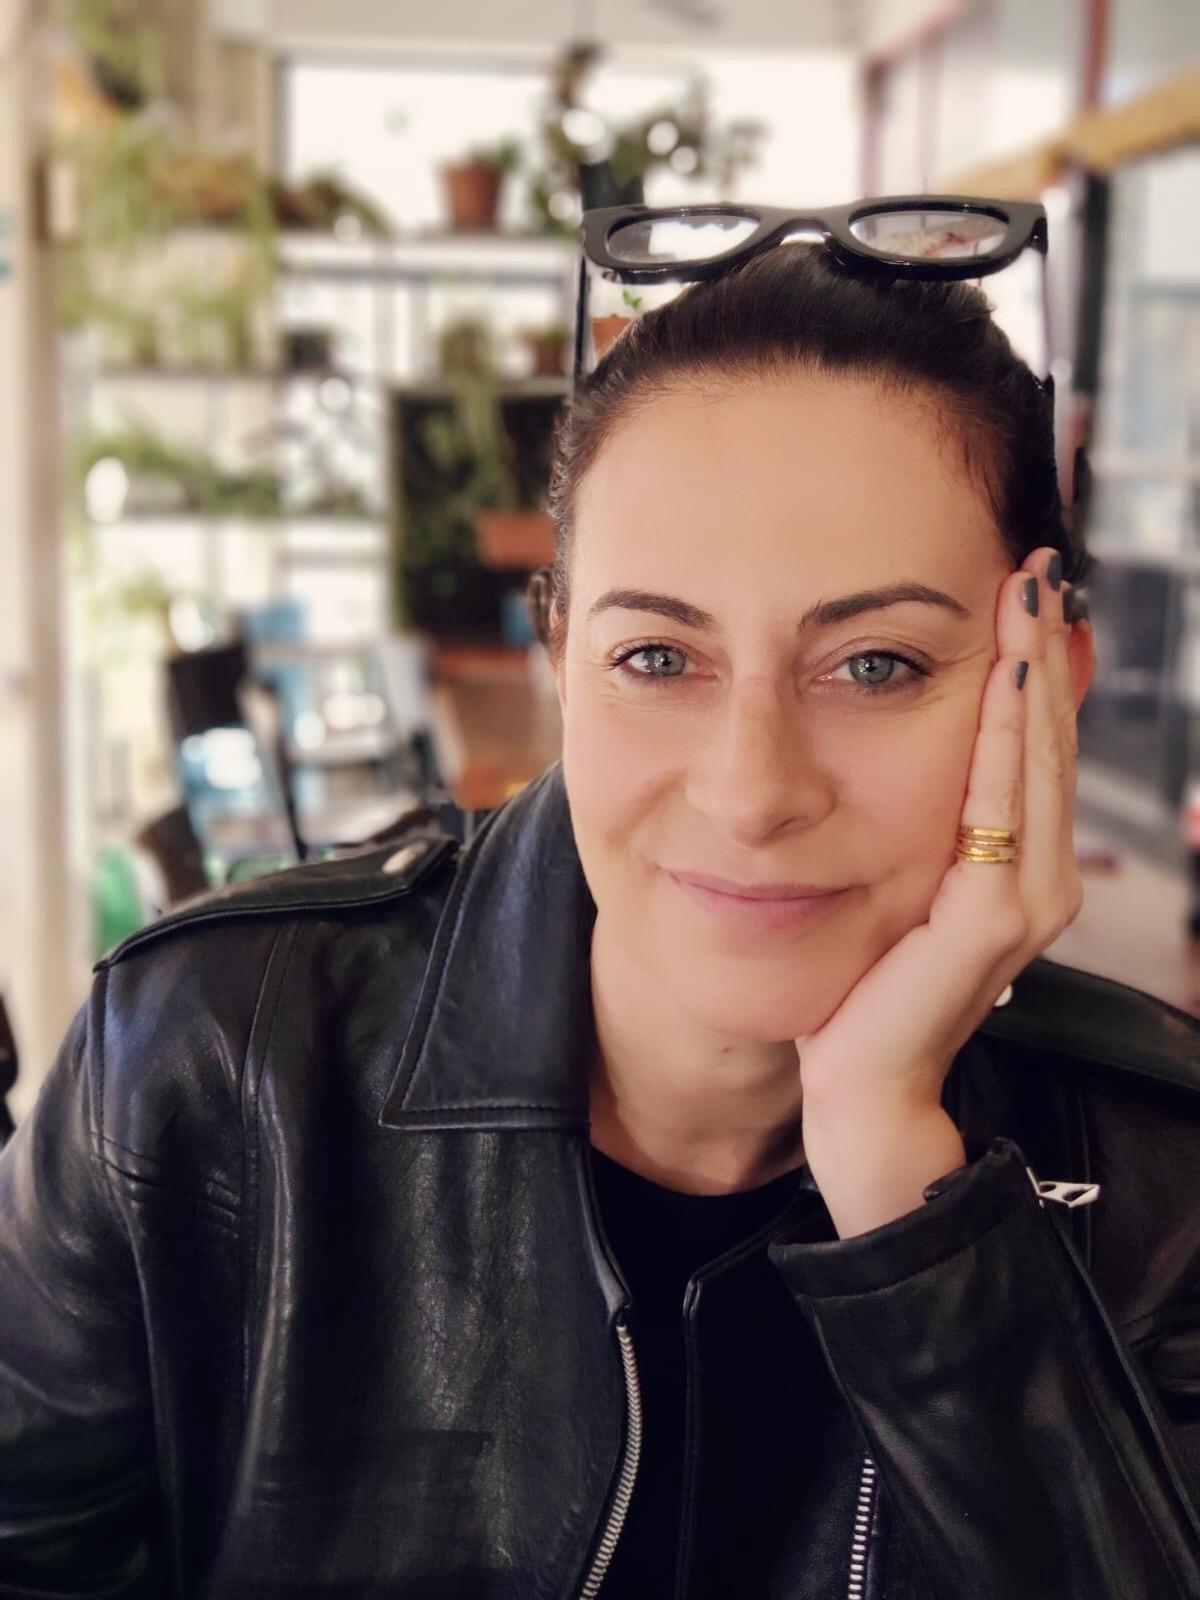 פאולה לטרובסקי | סטייליסטית אישית, סטיילינג אישי 3 סטייליסטית אישית